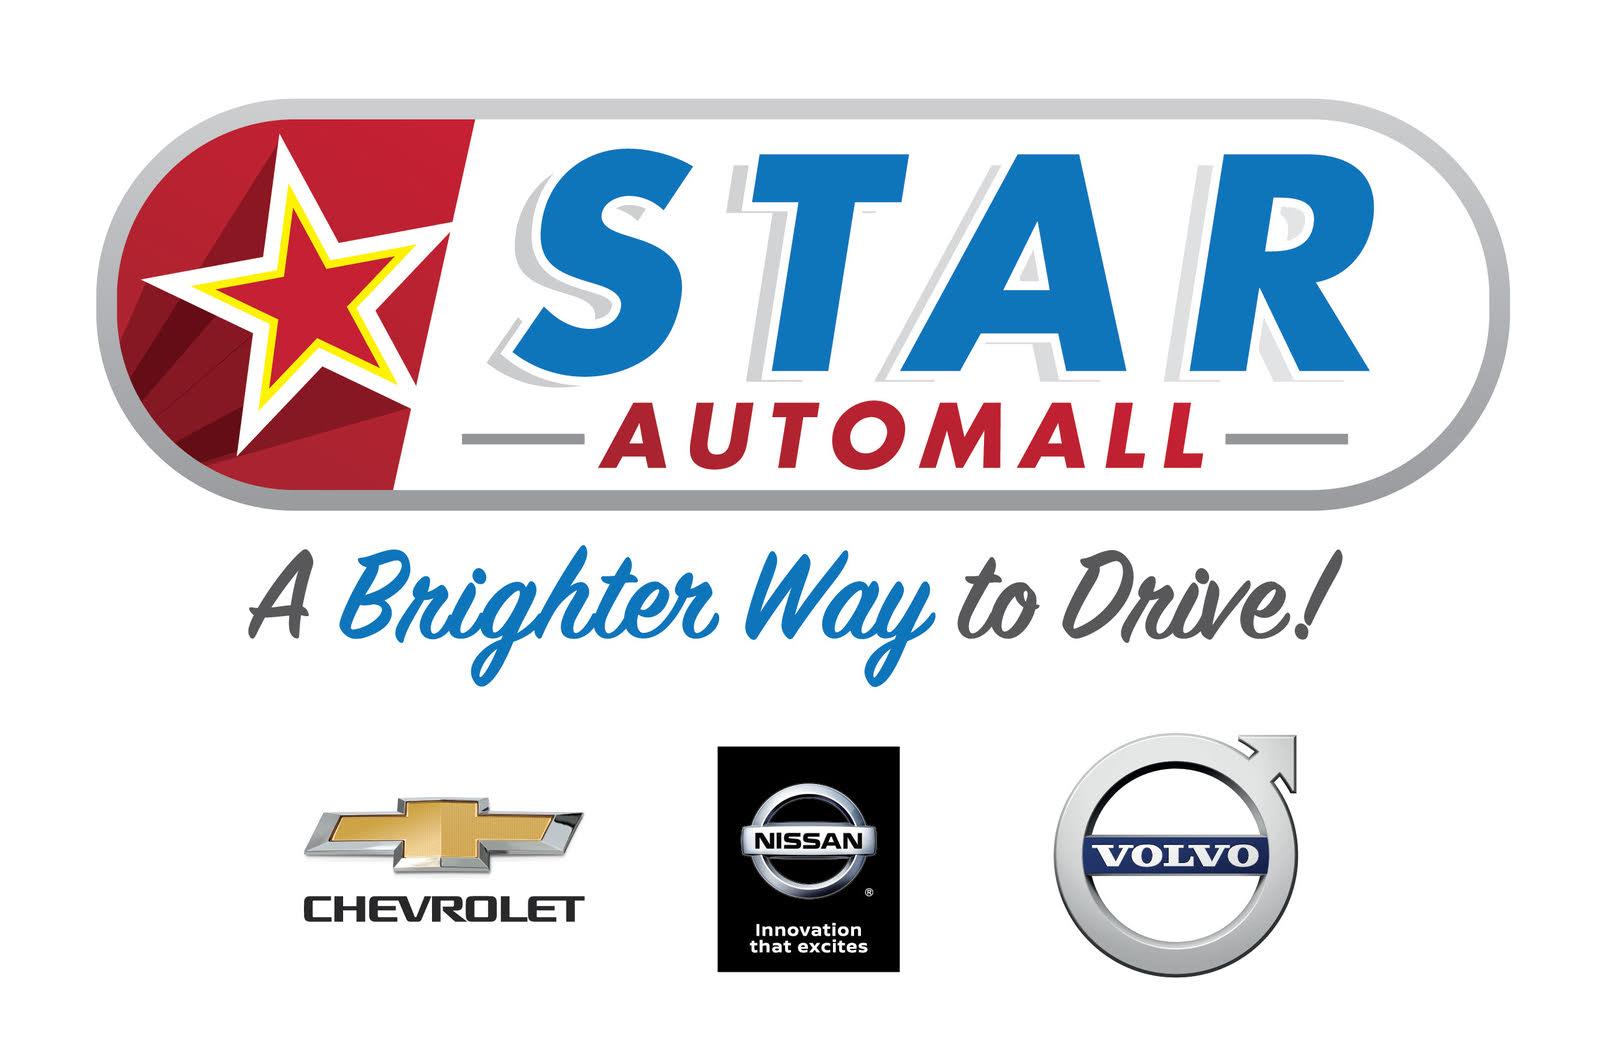 Star Auto Mall Chevrolet Nissan Volvo Greensburg Pa Read